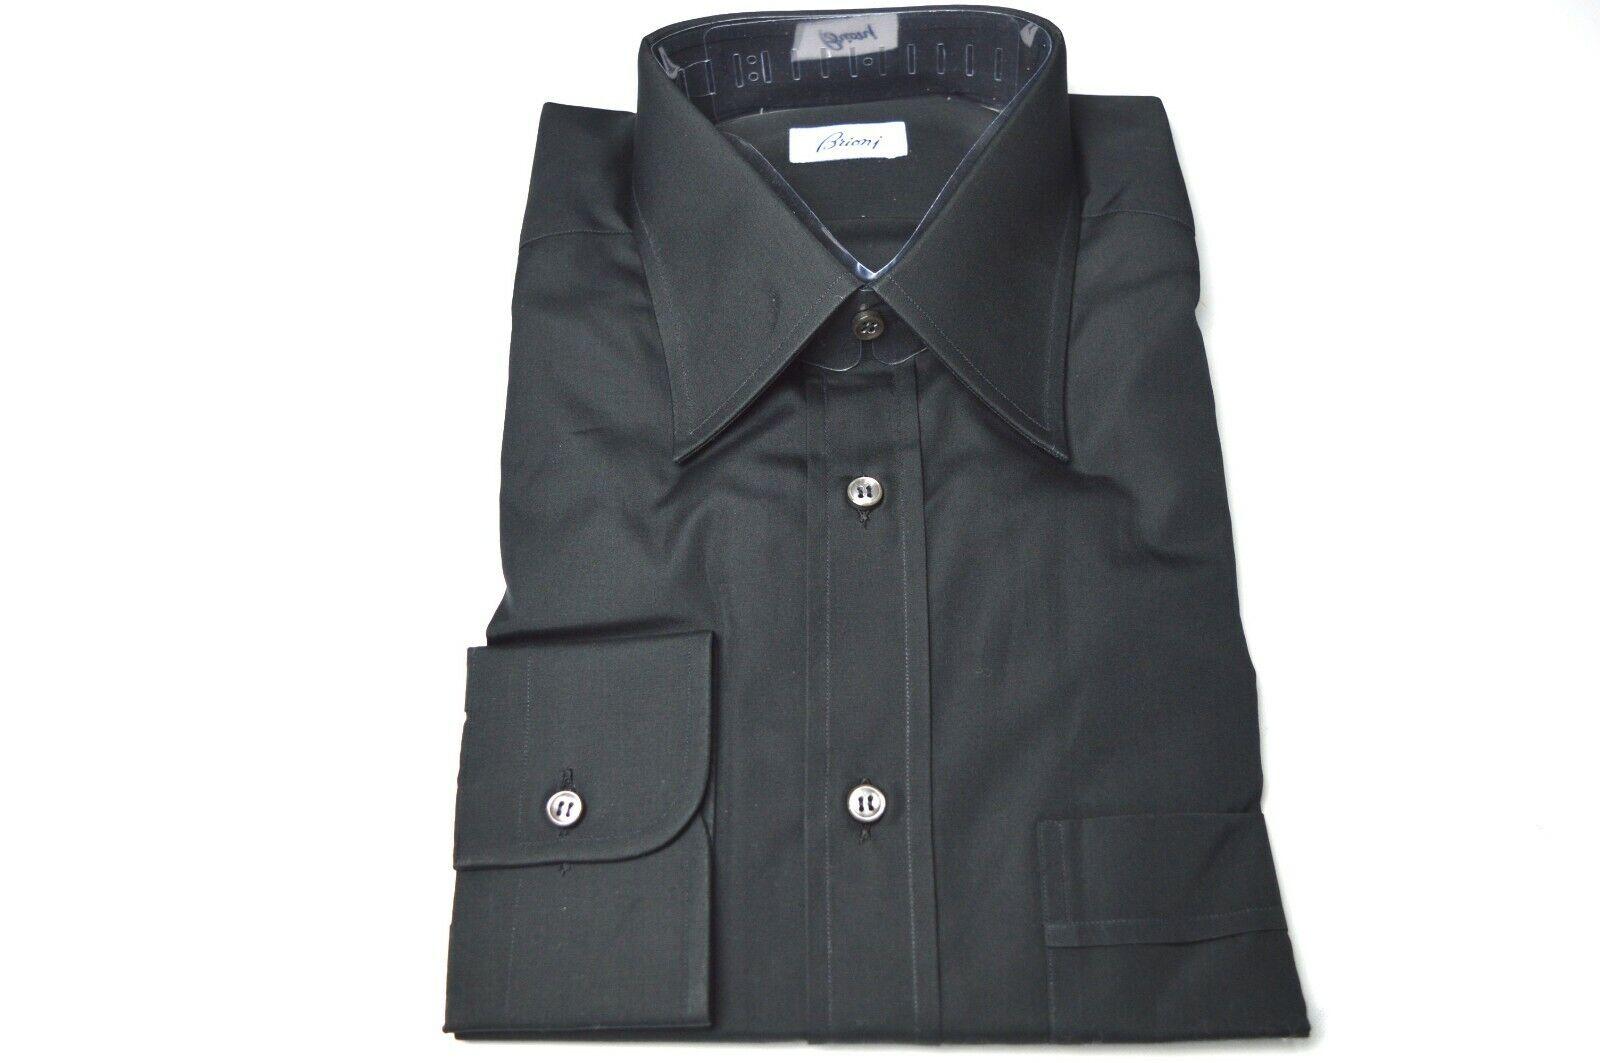 NEW  BRIONI Dress  SHIRT 100% Cotton Size 15 Us 39 Eu  (ARA209)